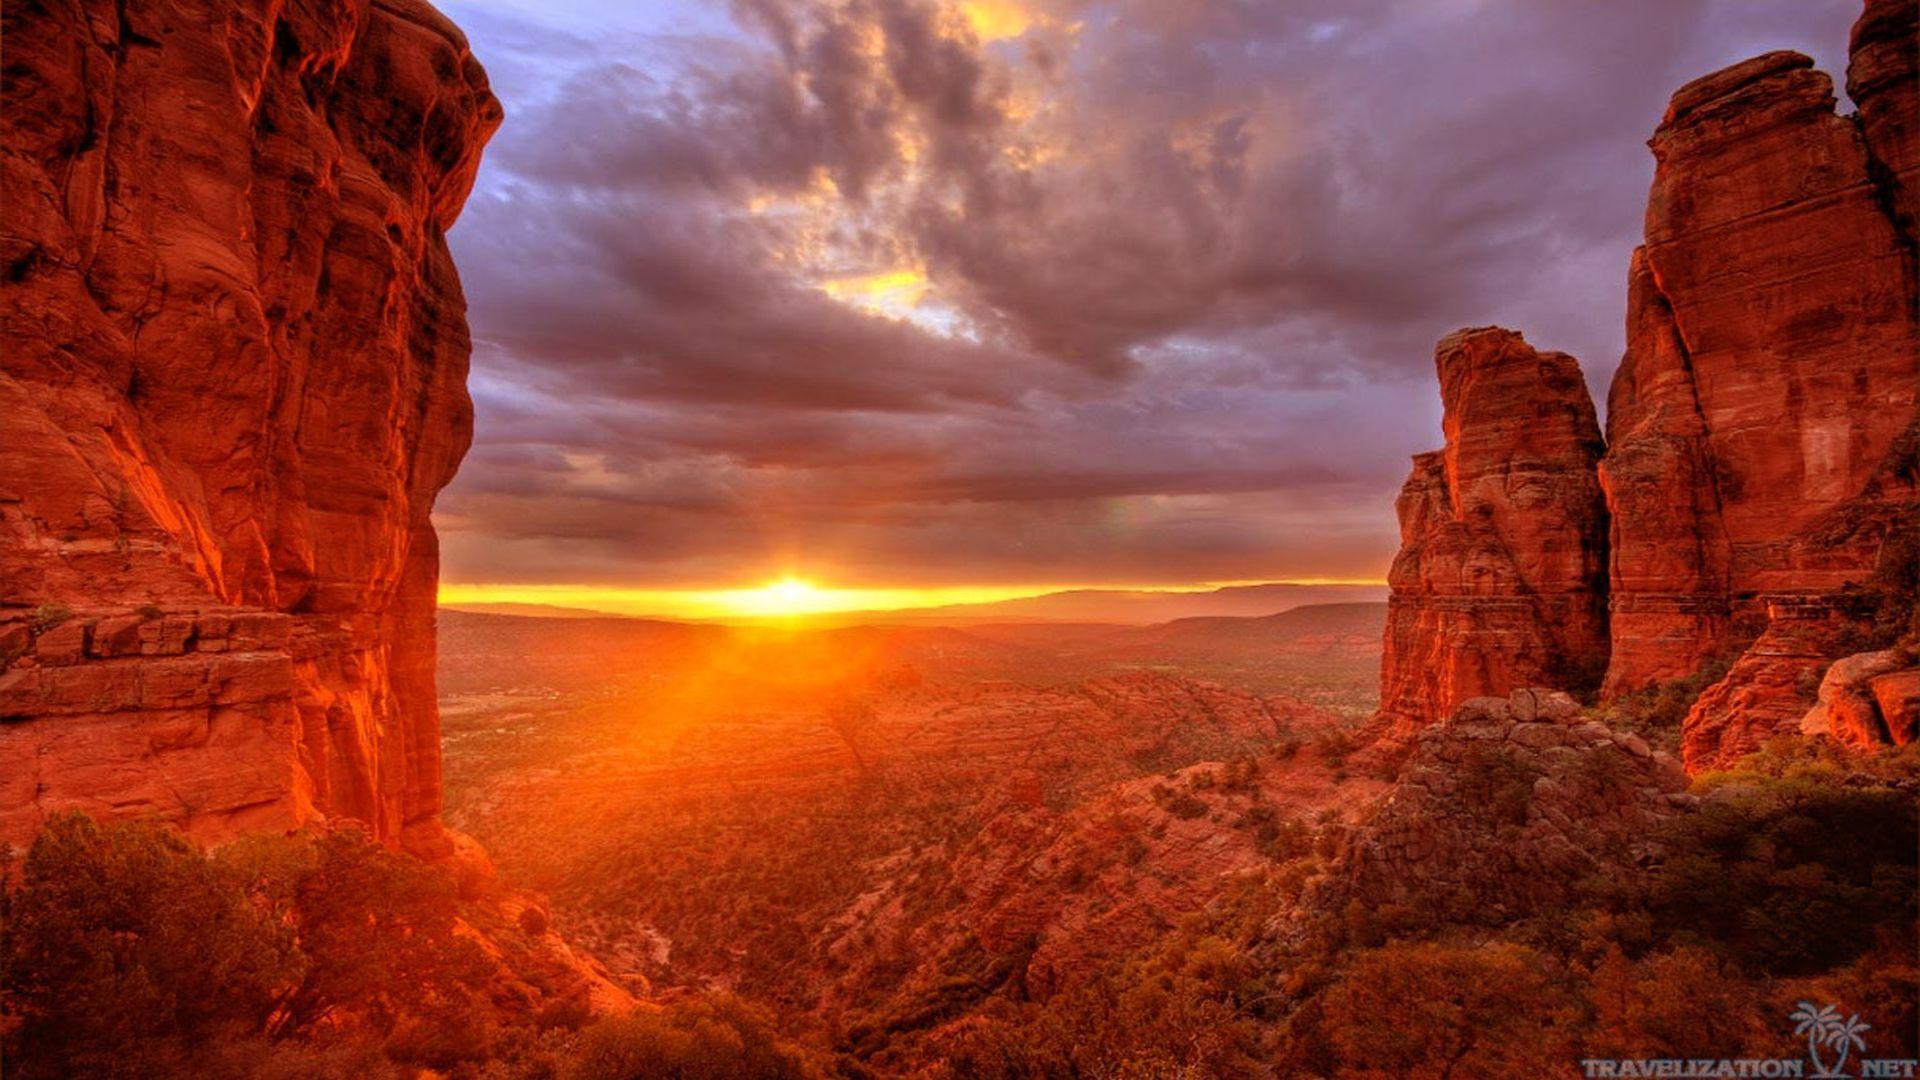 Arizona Sunset Pictures wallpaper 1920x1080 79403 1920x1080